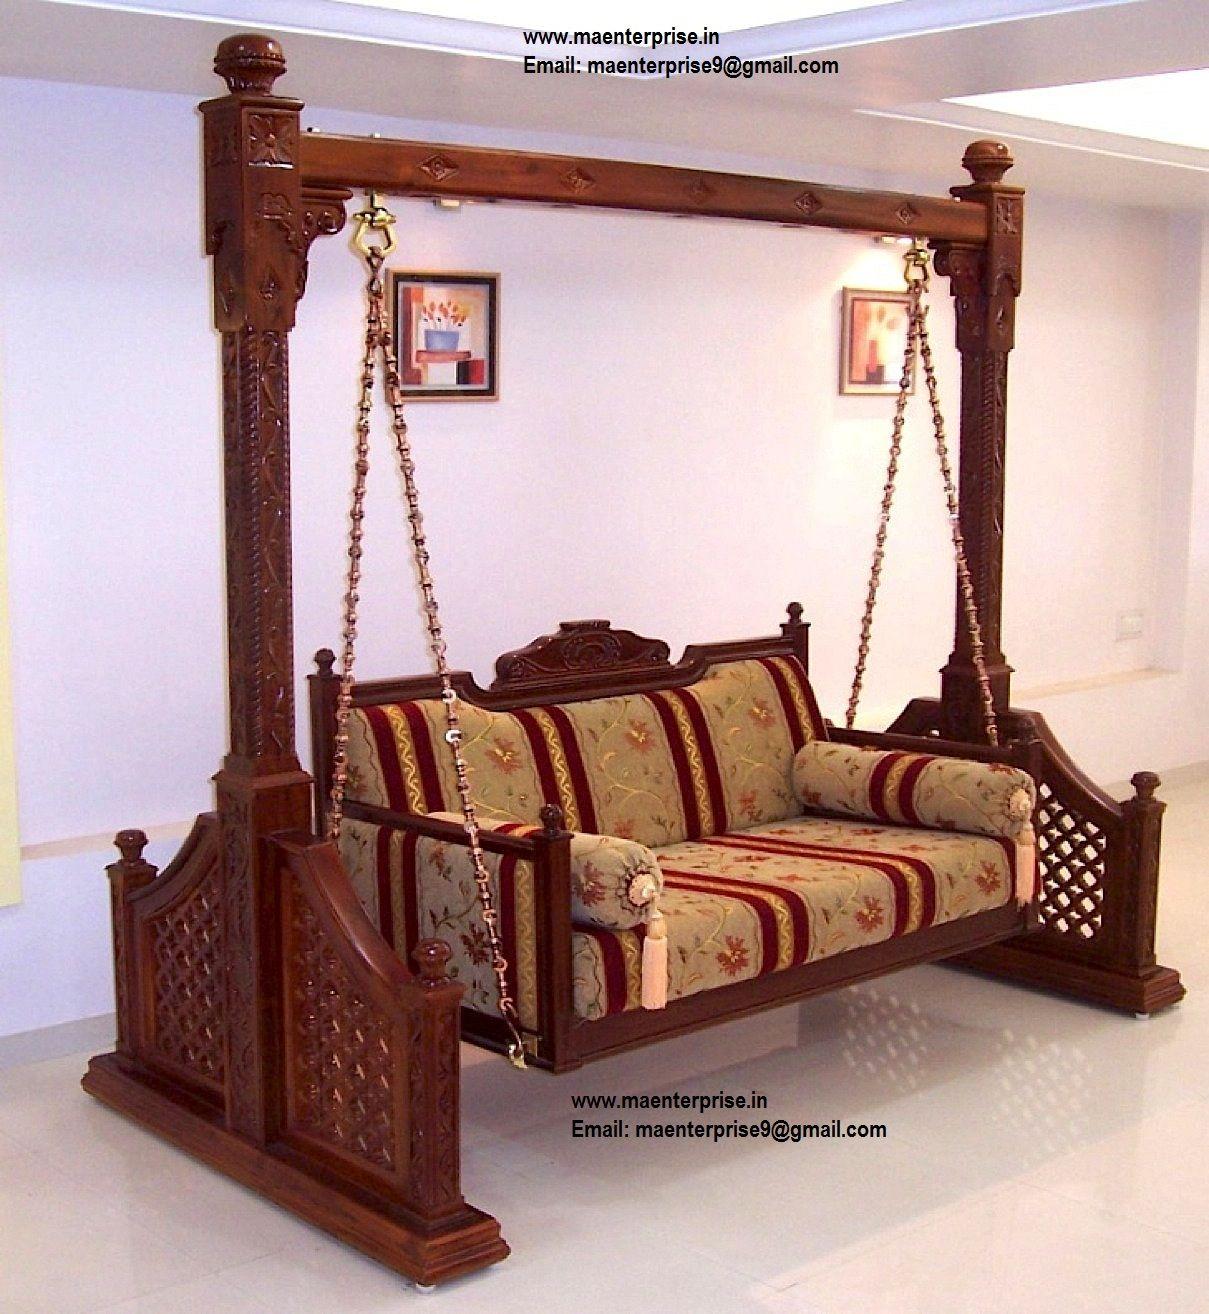 steel chair jhula backs for bleachers indian home decor jhoola swing jula pinterest wooden